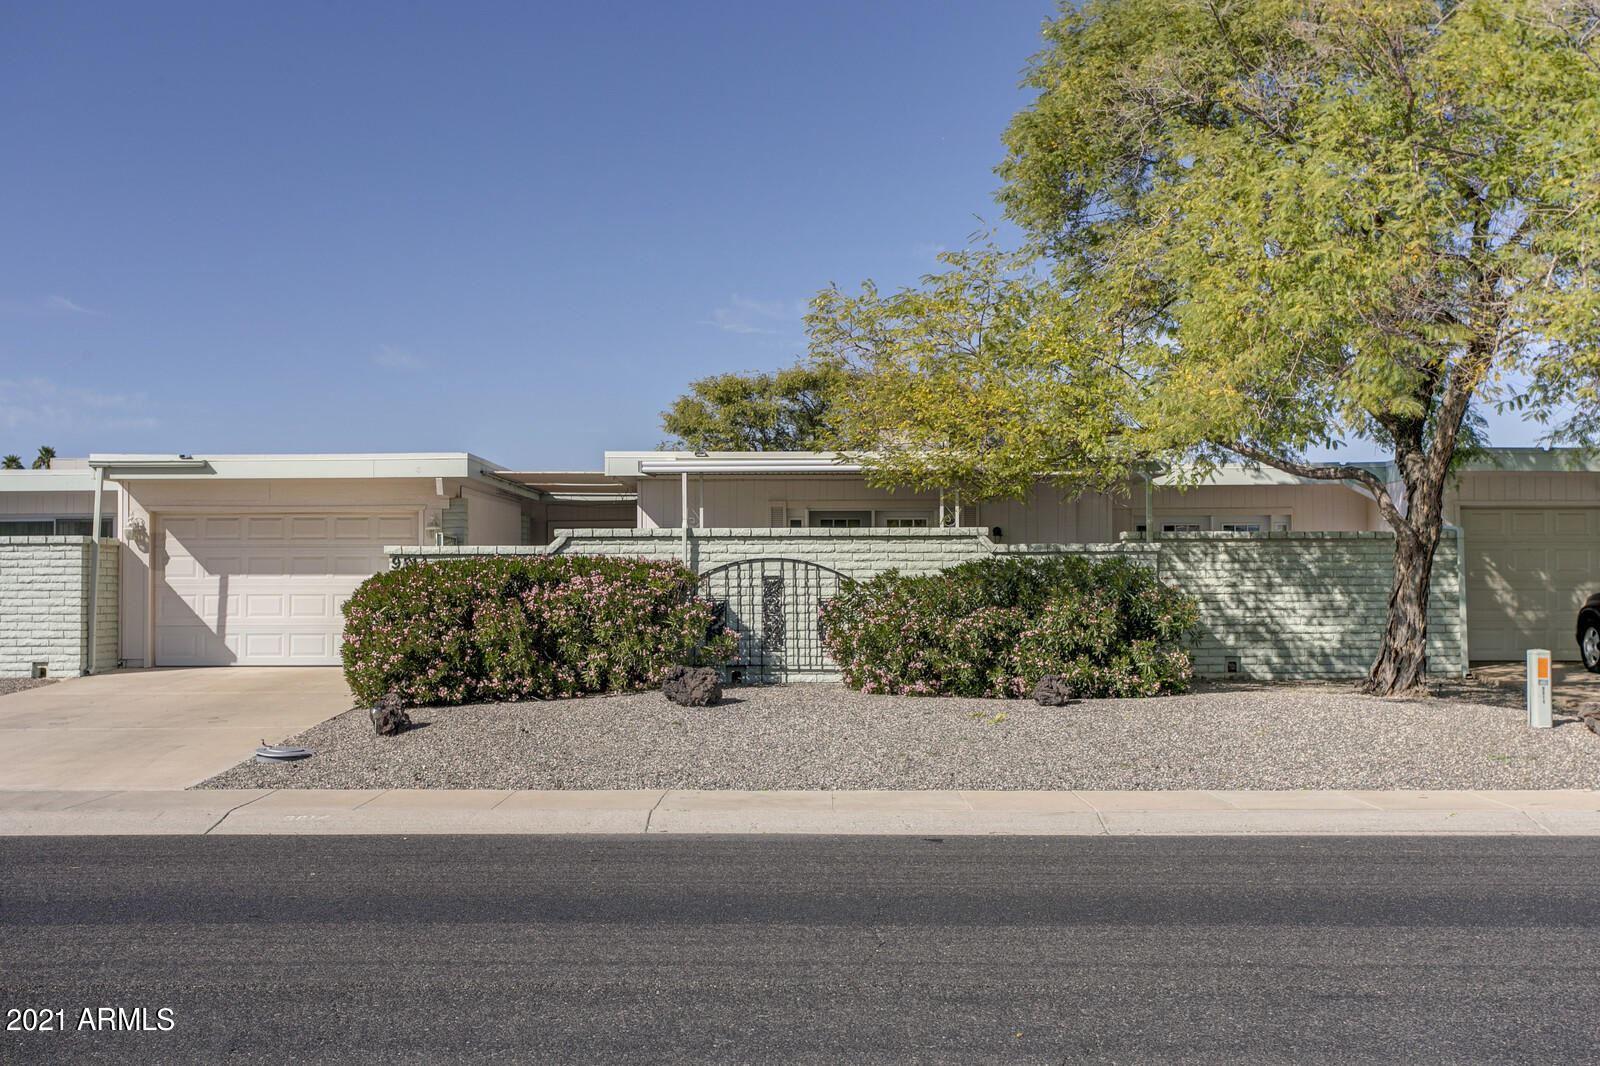 Photo of 9814 W TEAKWOOD Drive, Sun City, AZ 85351 (MLS # 6202610)